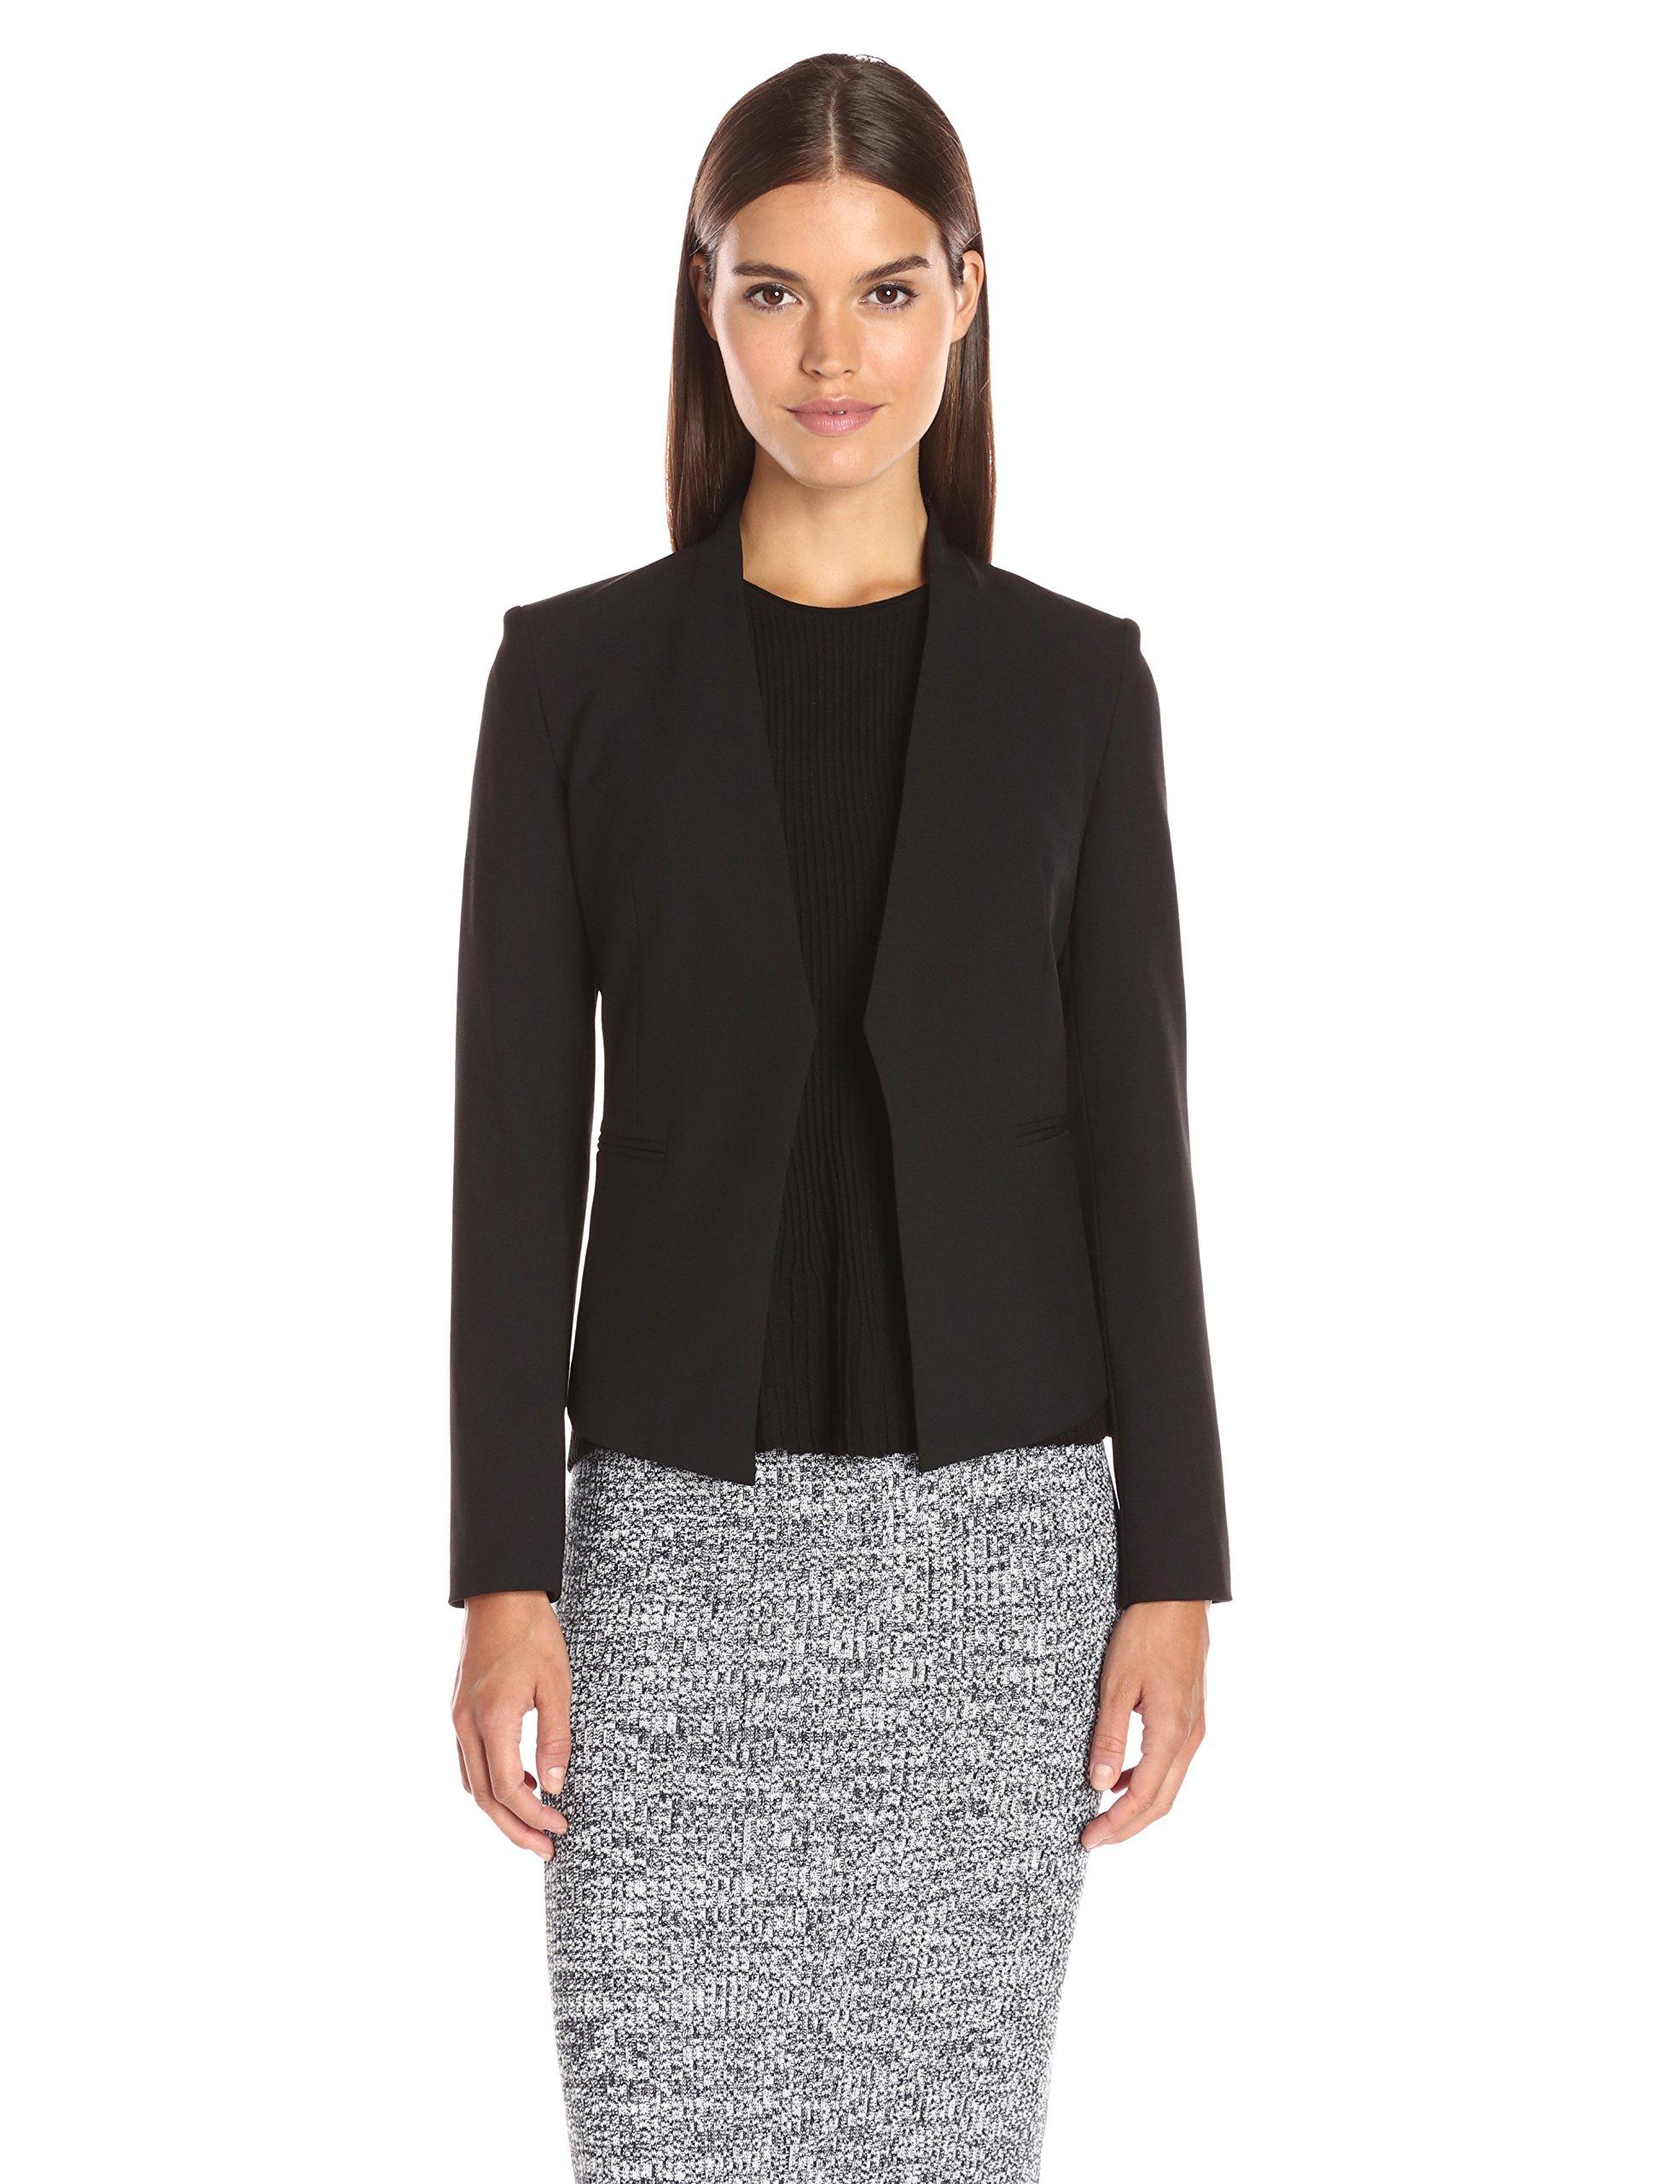 Theory Women's Lanai Edition 4 Jacket, Black, 8